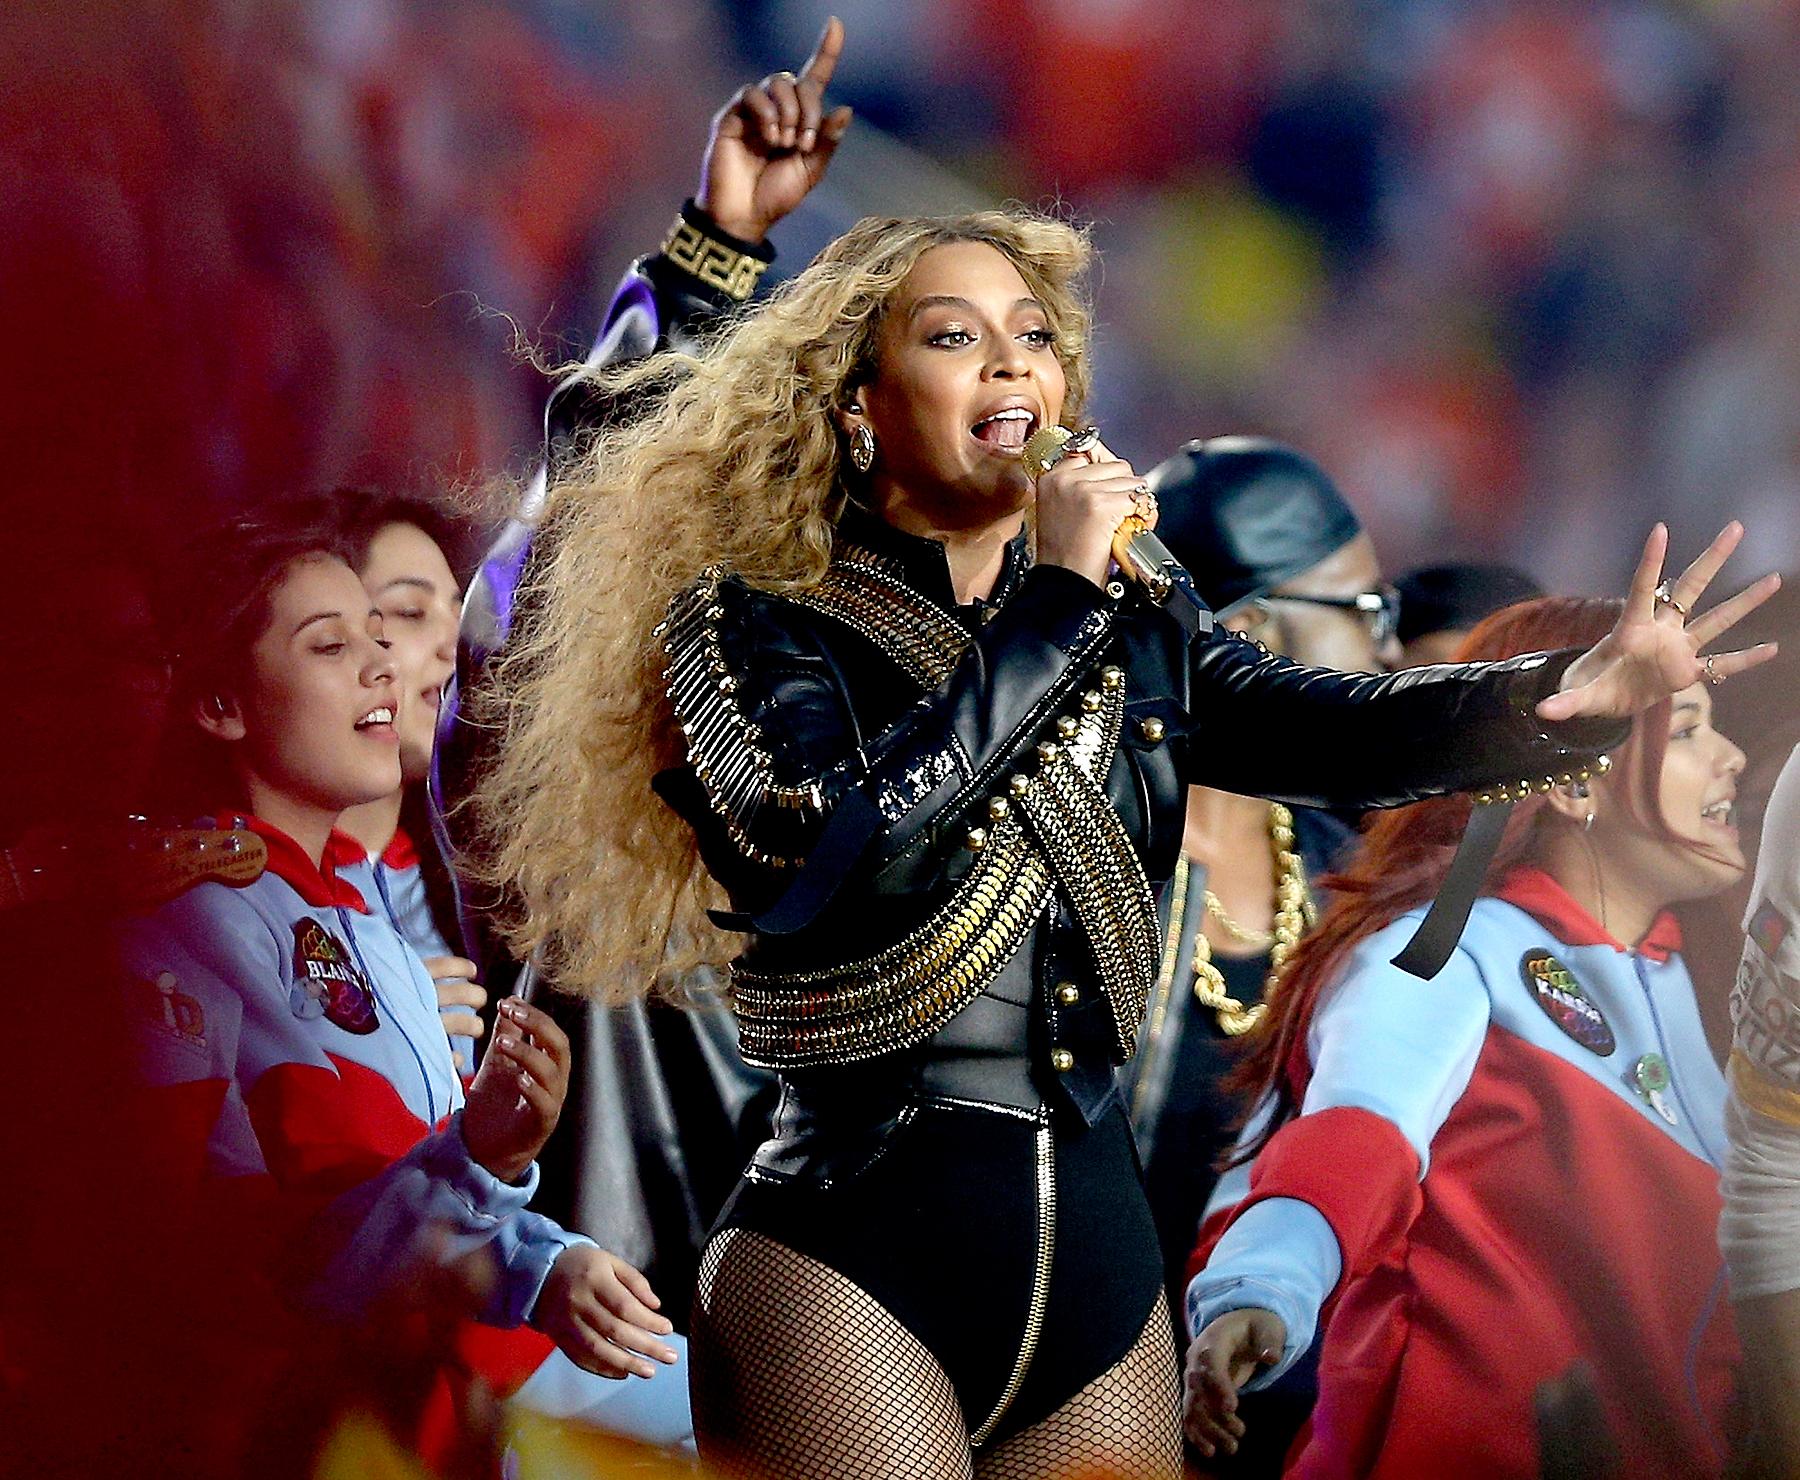 Beyoncé performs during the Pepsi Super Bowl 50 halftime show.